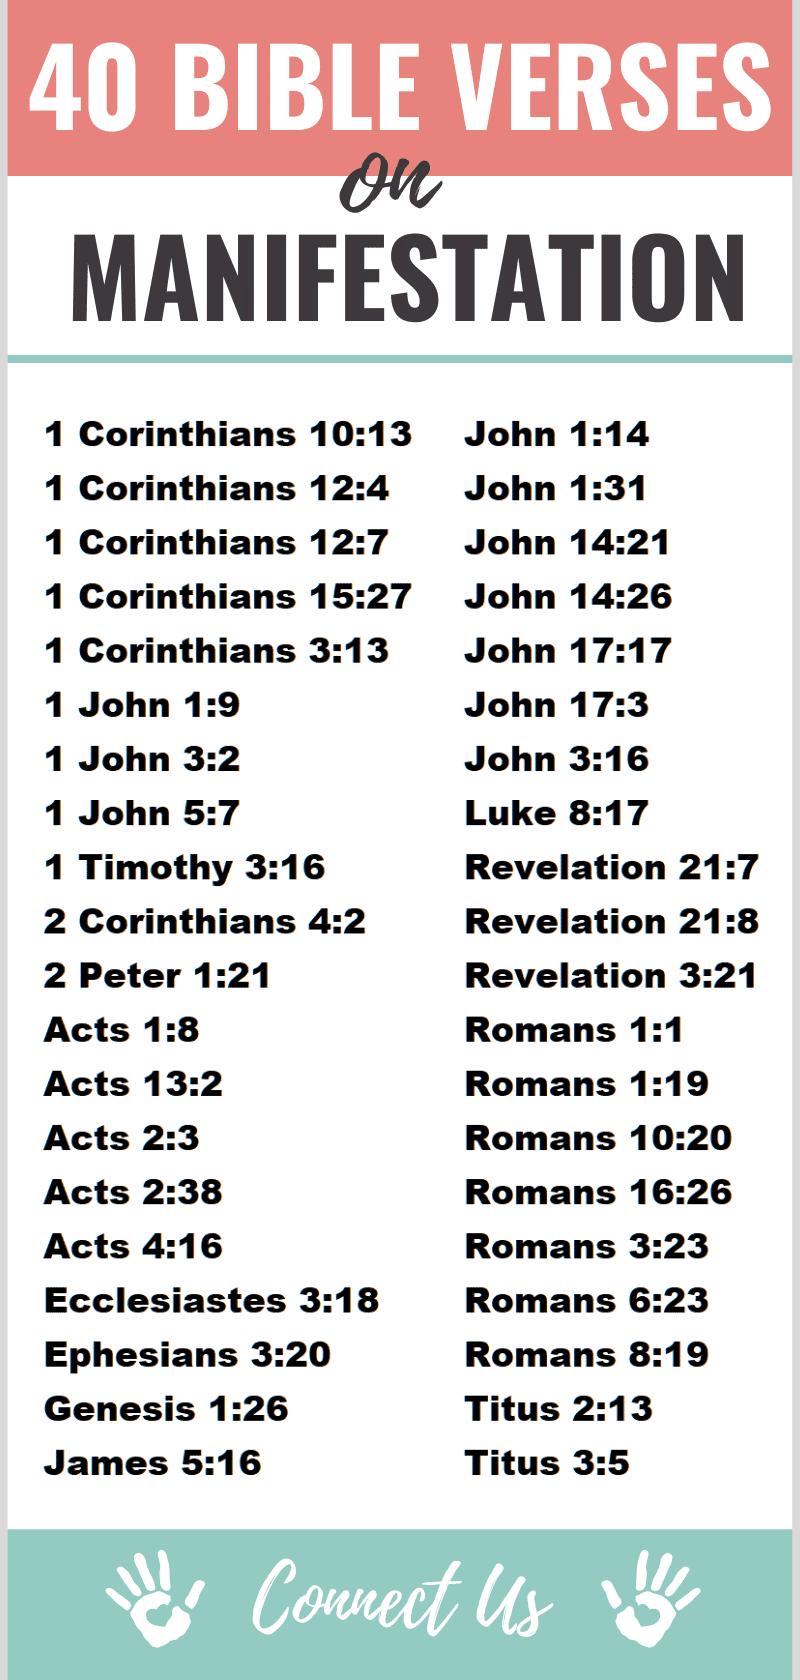 Bible Verses on Manifestation